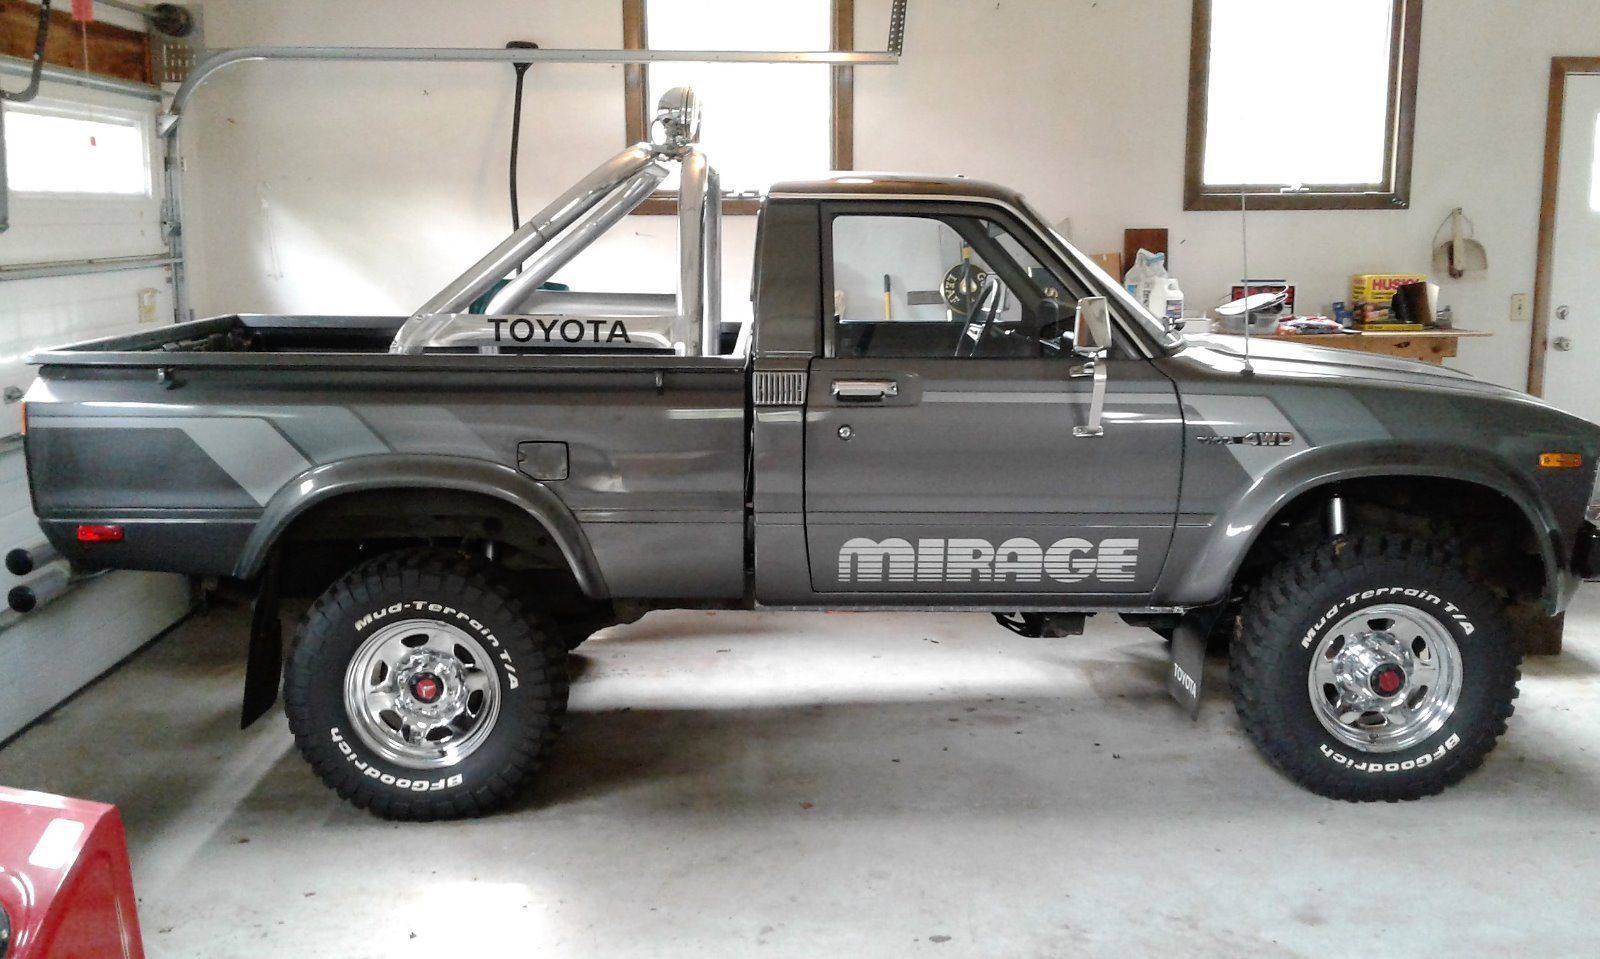 small resolution of 1983 toyota sr 5 4x4 pickup truck mirage limited edition 1983 toyota hilux 4x4 pickup truck mirage edition the toyota hilux tr